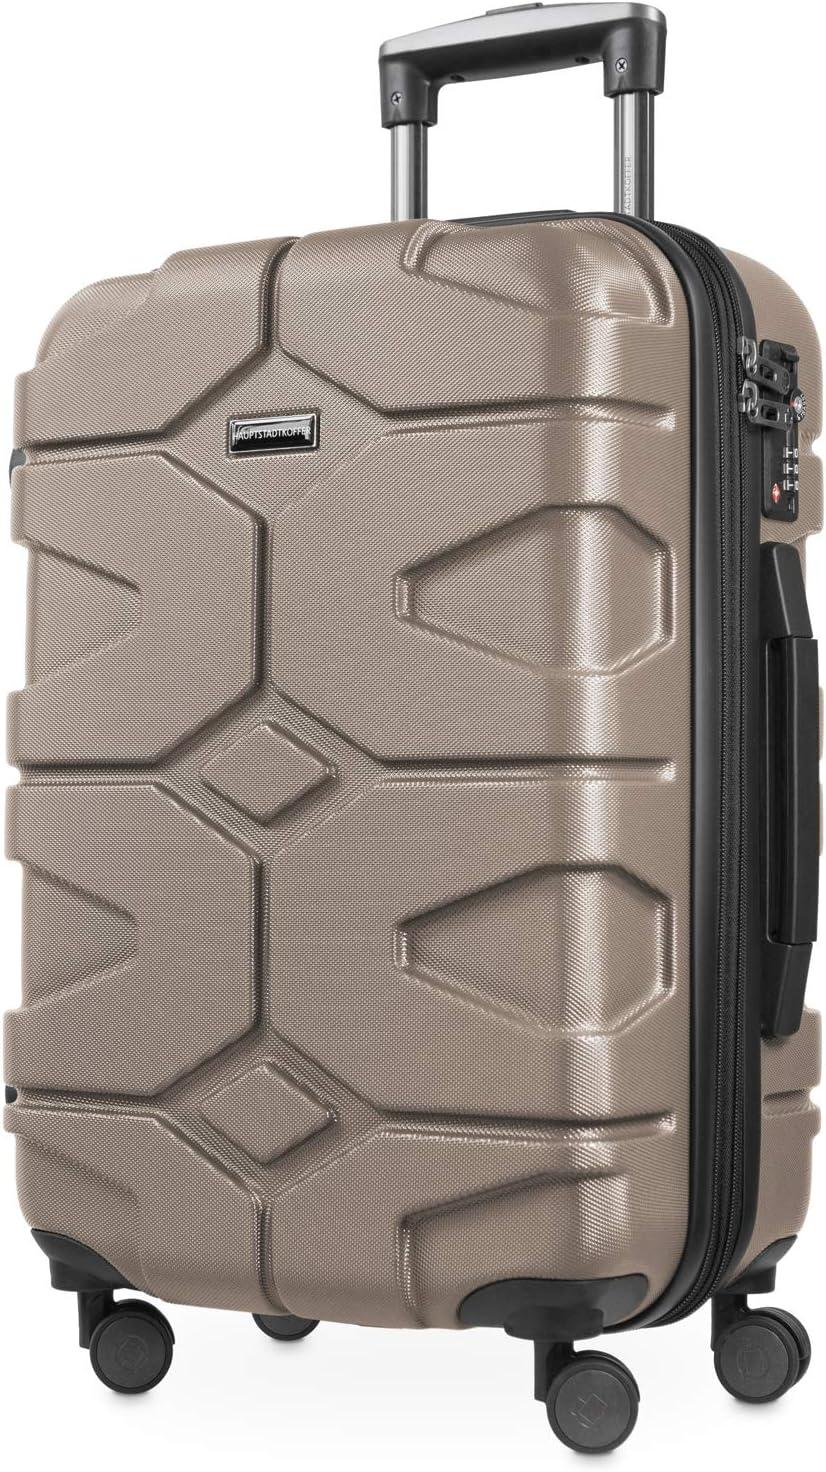 HAUPTSTADTKOFFER - X-Kölln - Equipaje de mano extensible, ABS, TSA, 55cm, 50L, Dorado